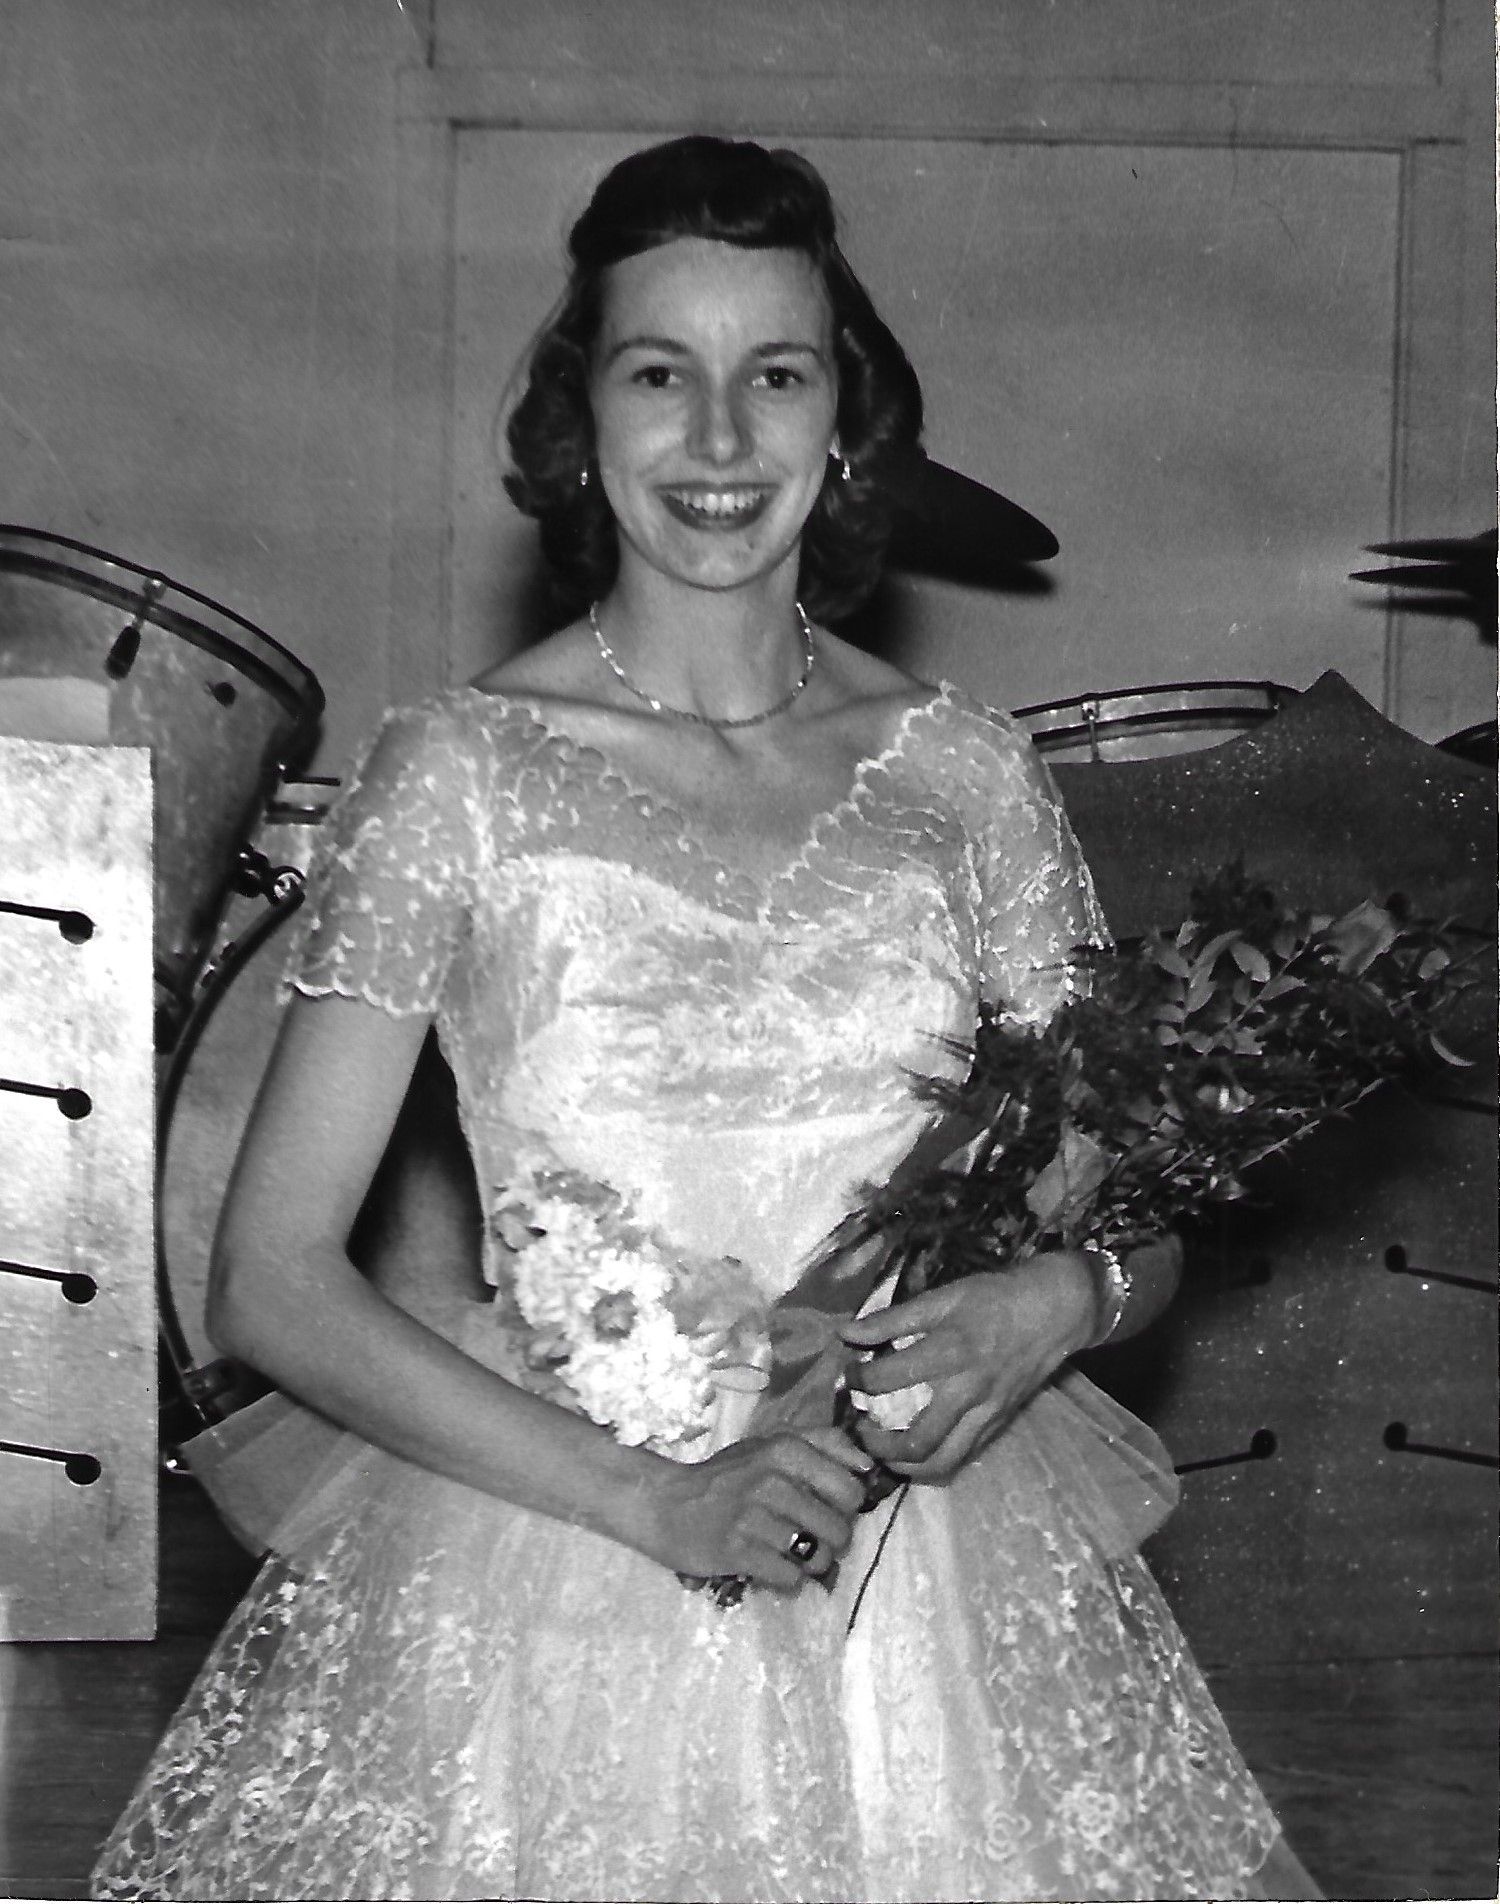 1955 Lincoln County Fair Queen